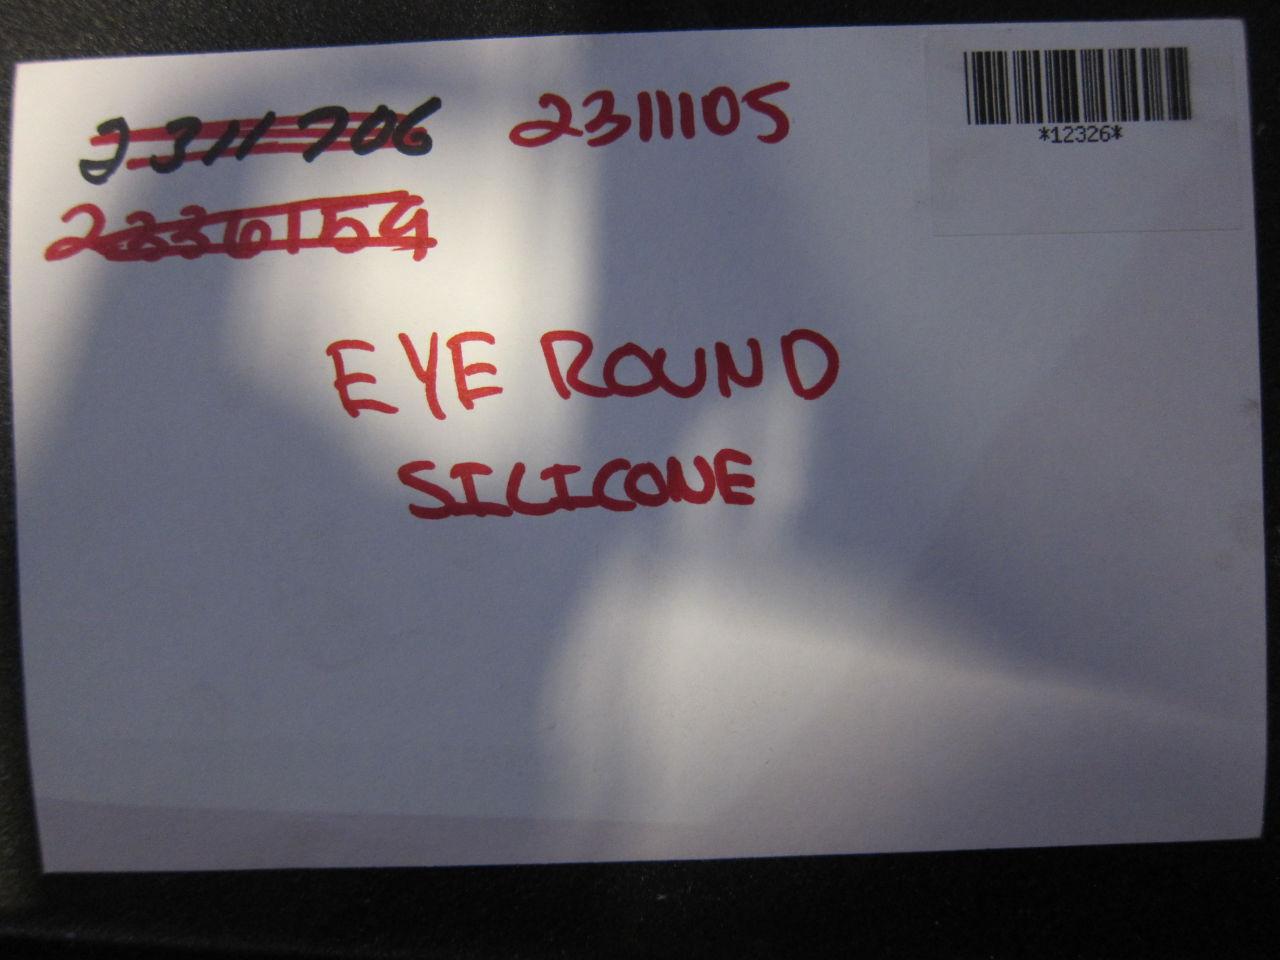 Eye Round Silicone